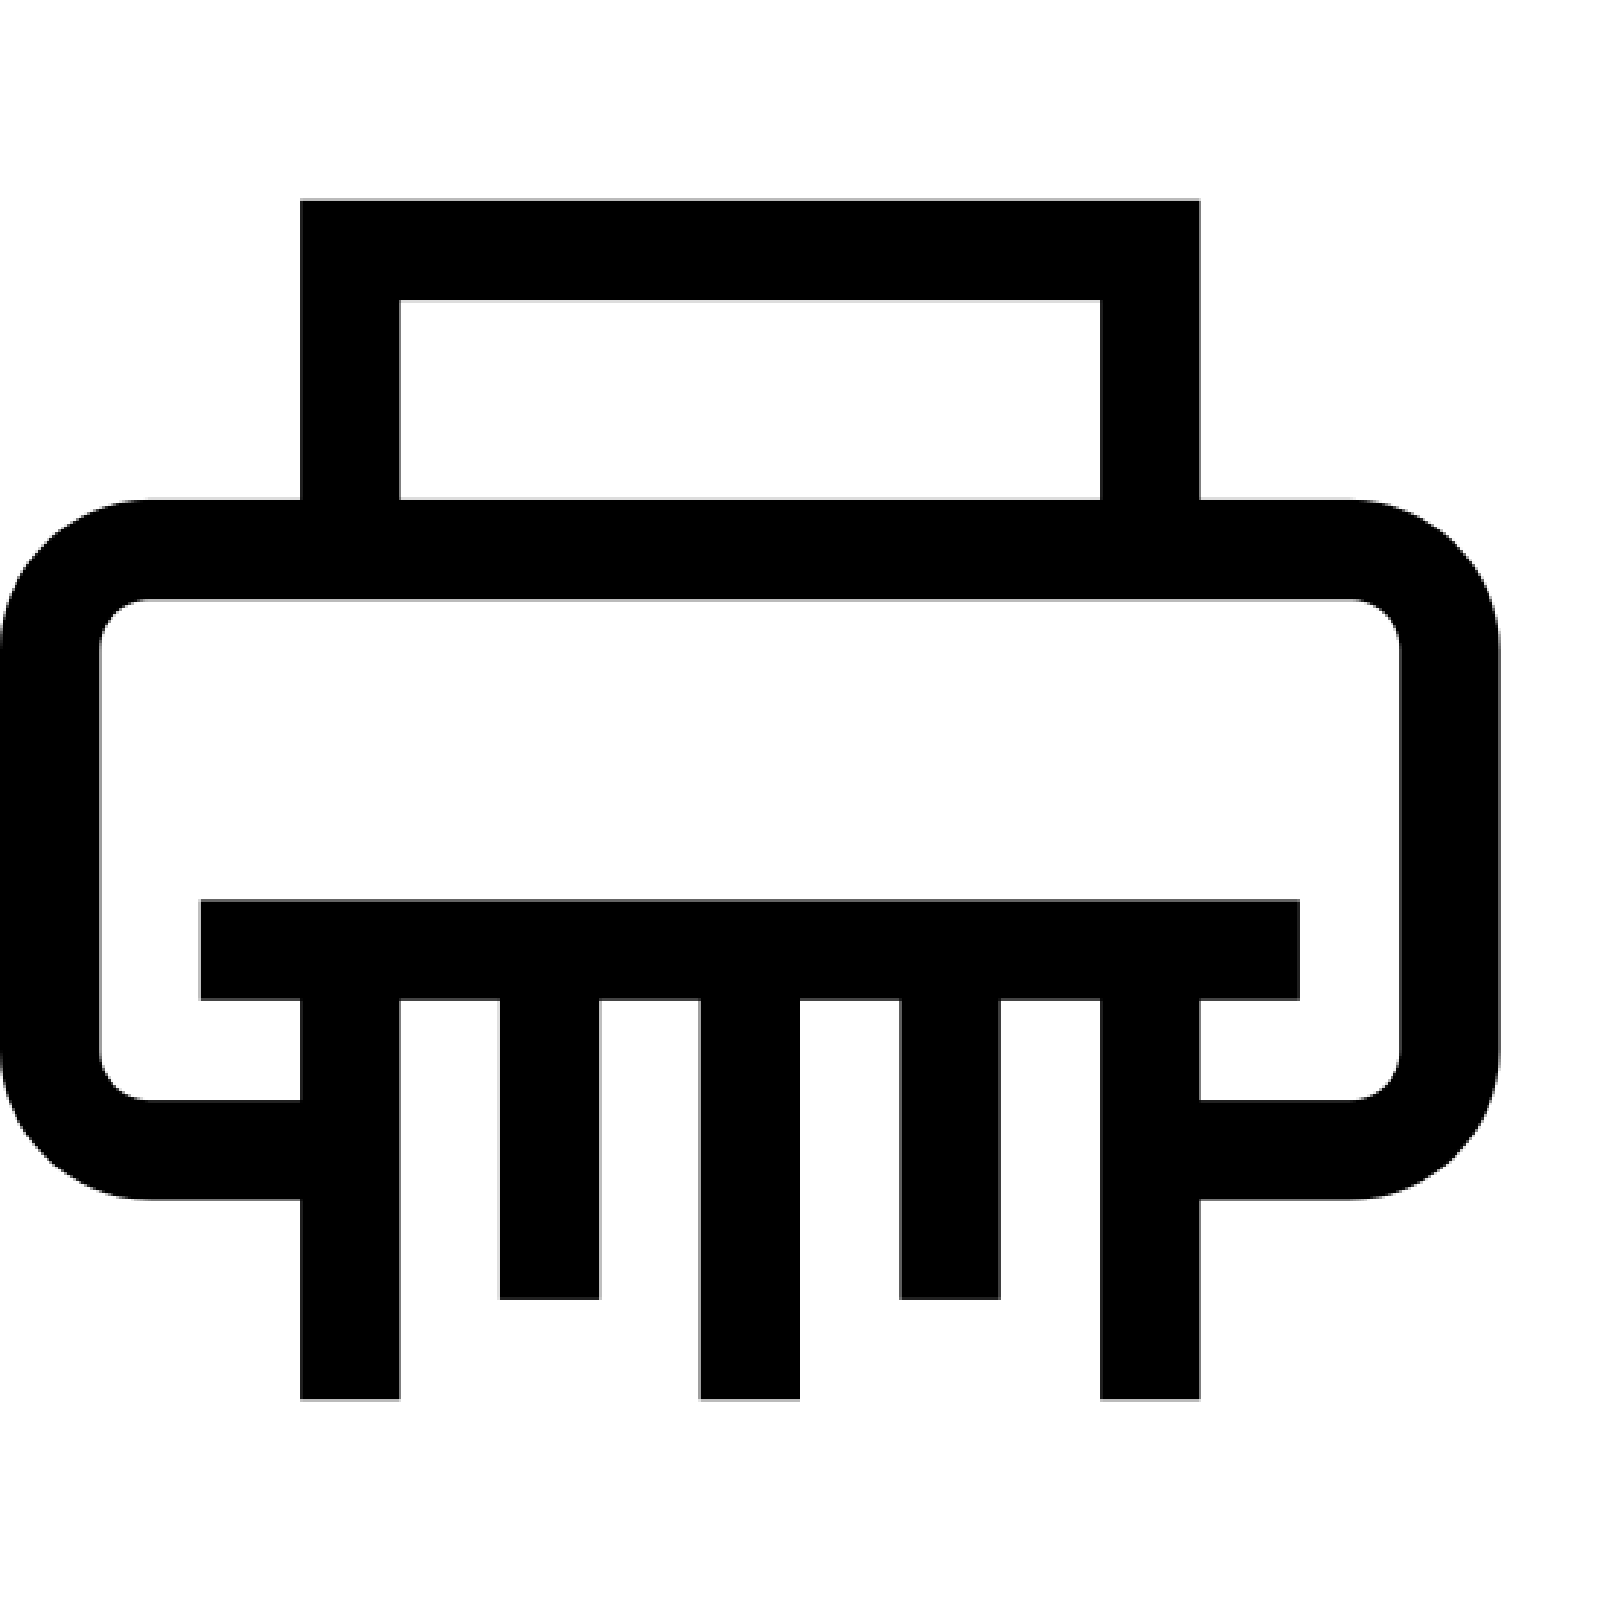 Niszczarka icon